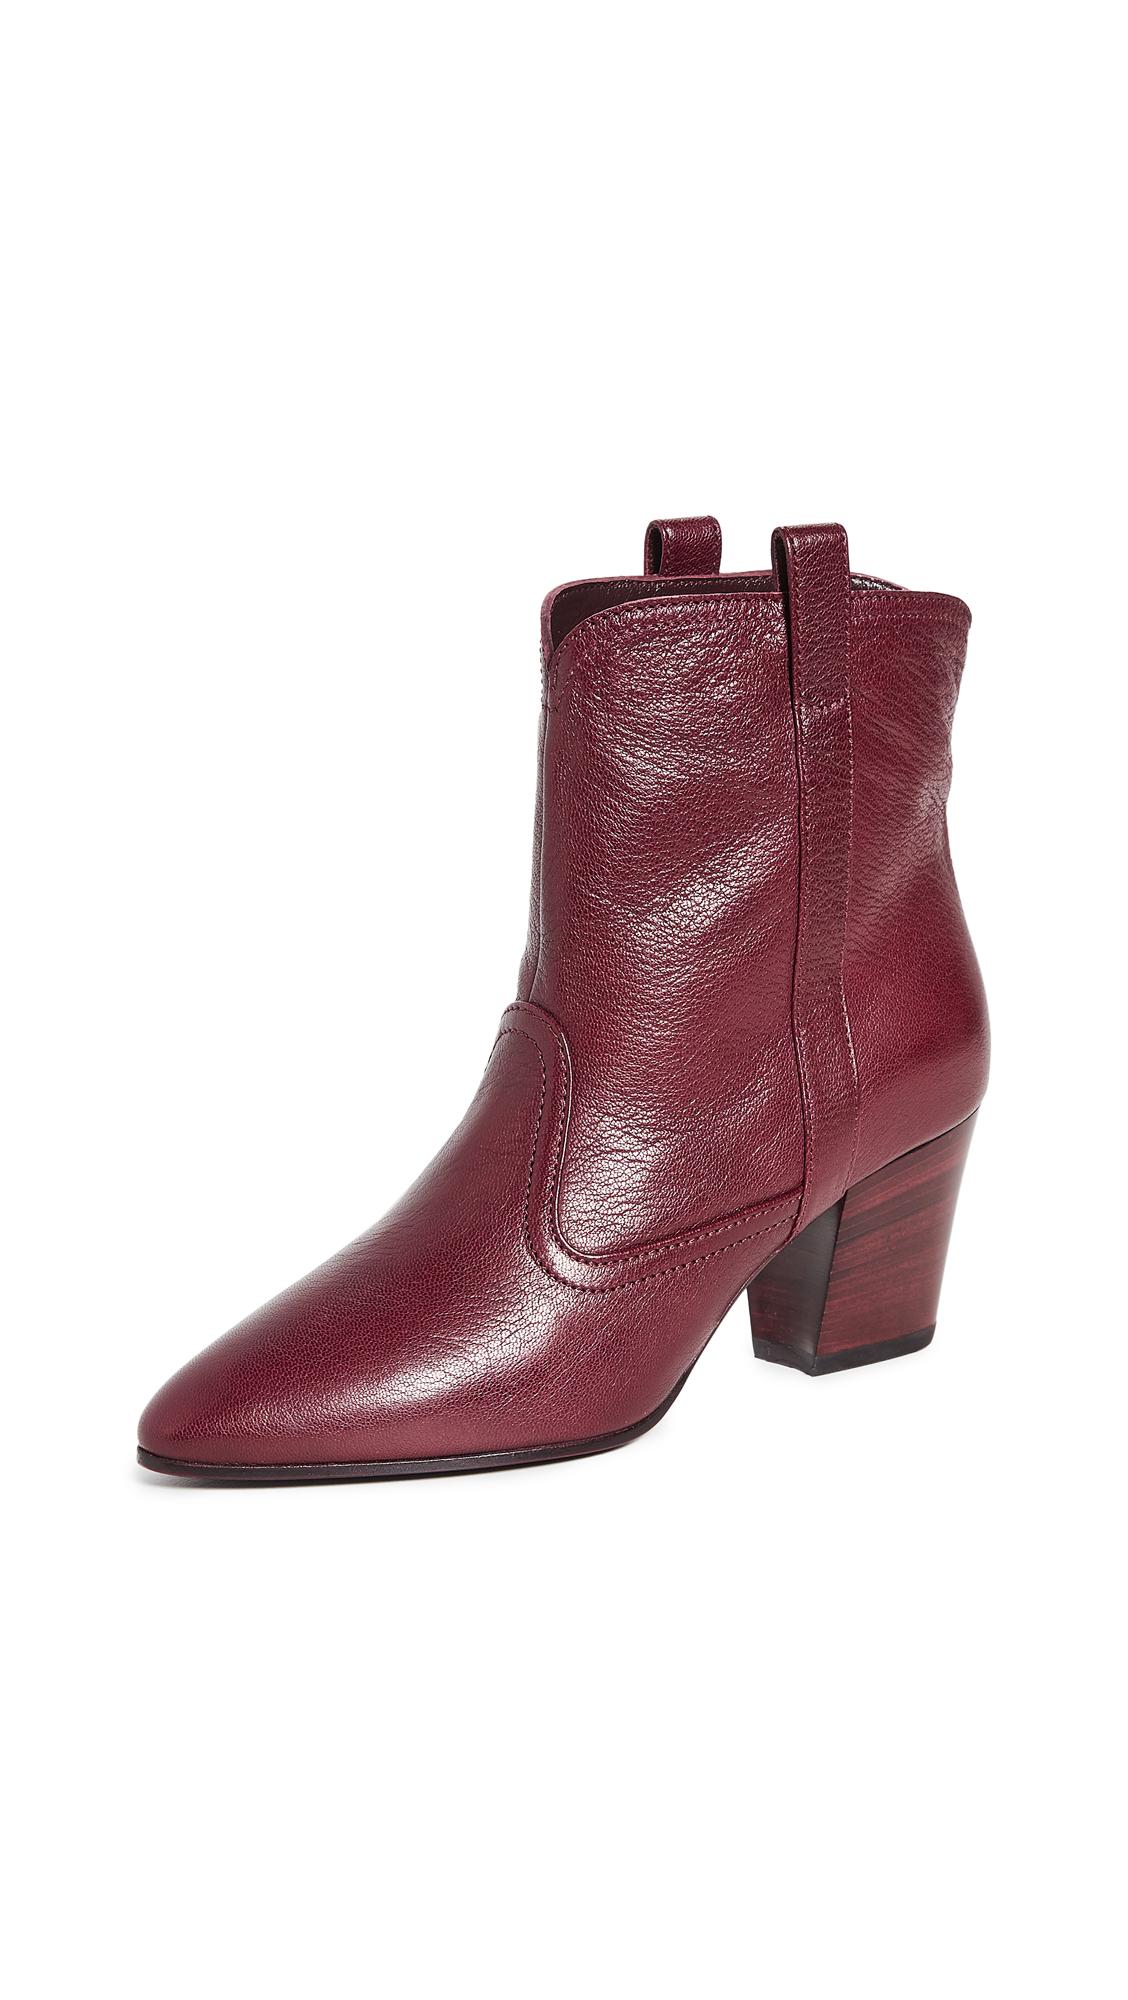 Laurence Dacade Sheryll Booties - 70% Off Sale